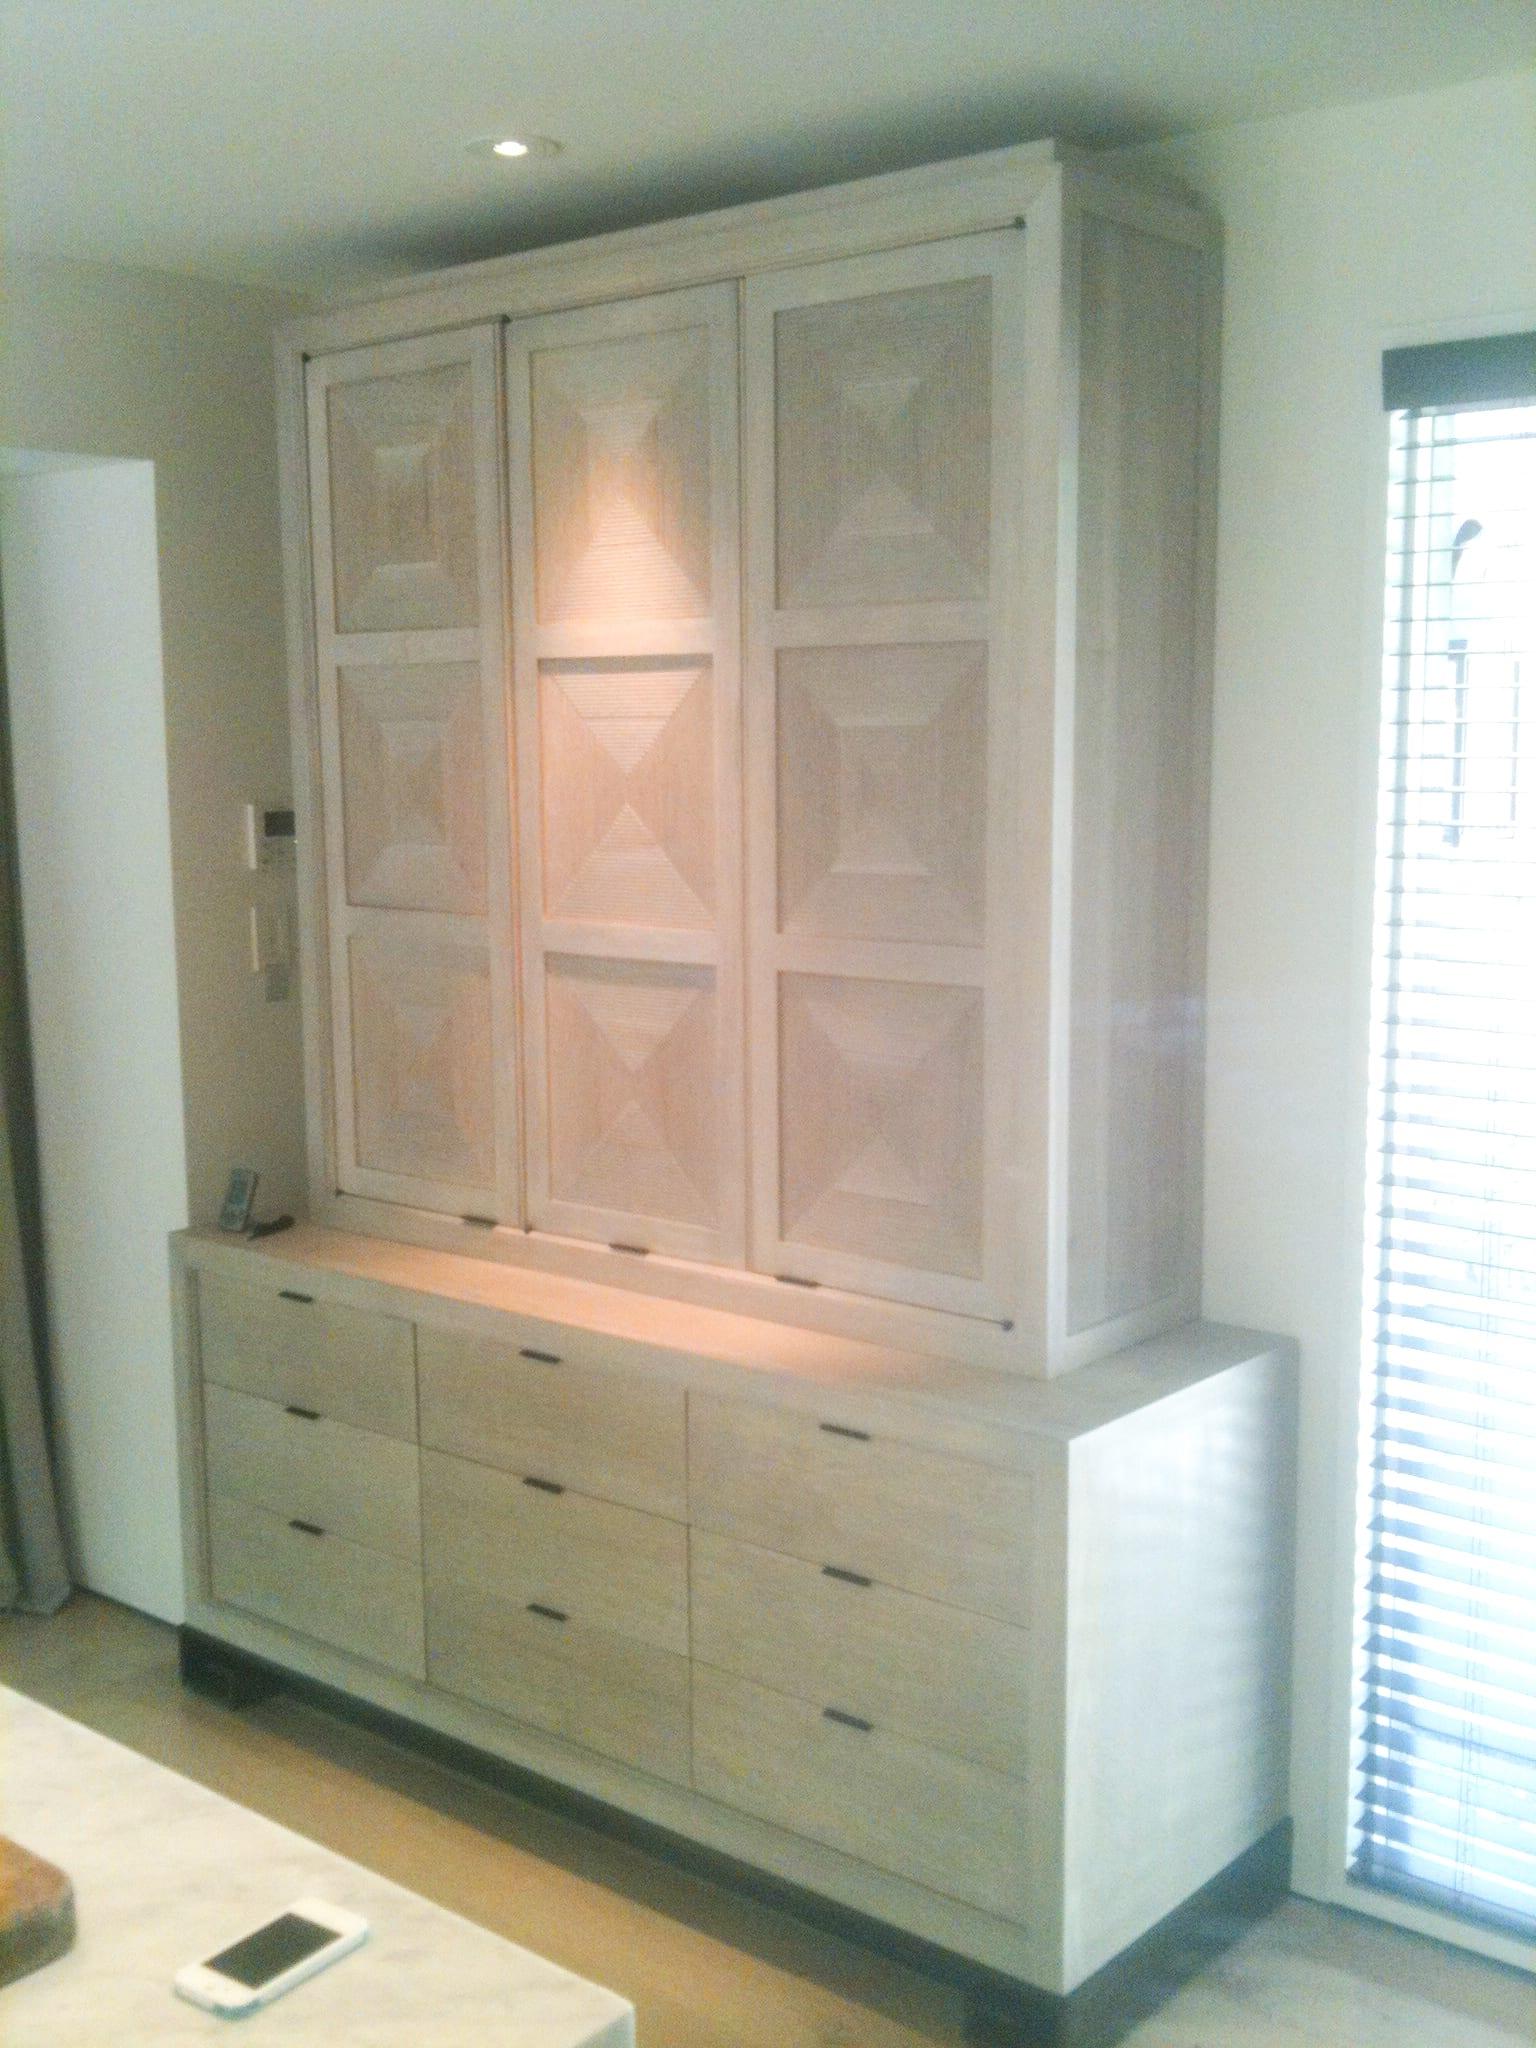 White Oak Entertainment Console with White Oak Cabinets